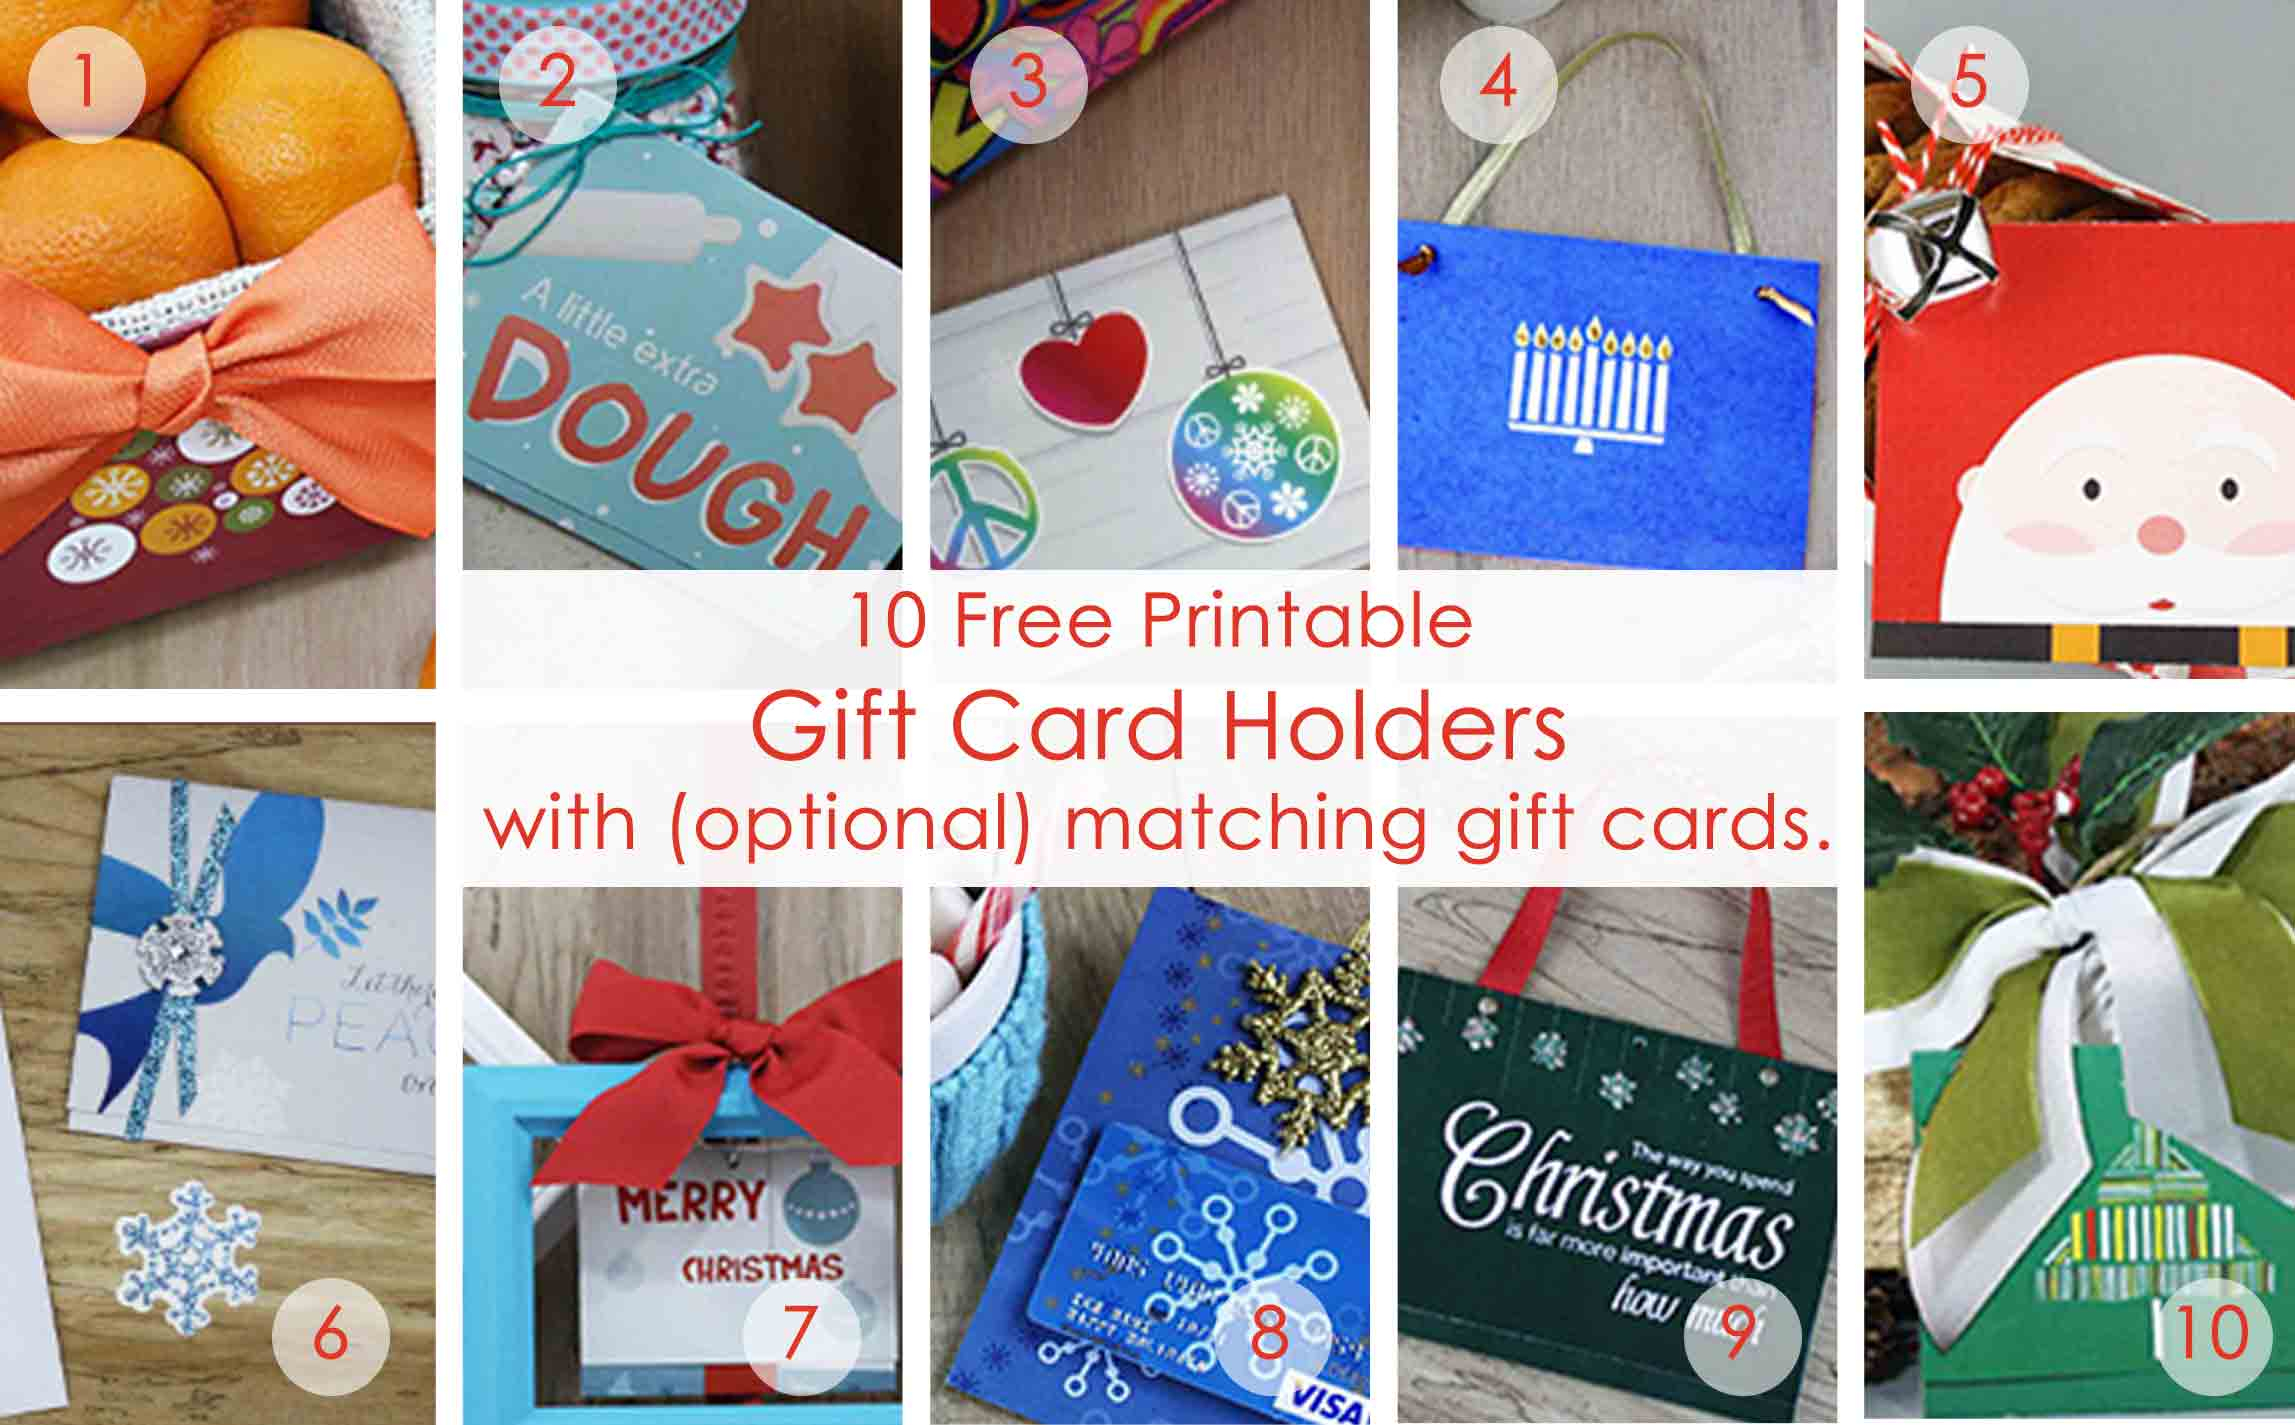 Over 50 Printable Gift Card Holders For The Holidays | Gcg - Christmas Money Wallets Free Printable